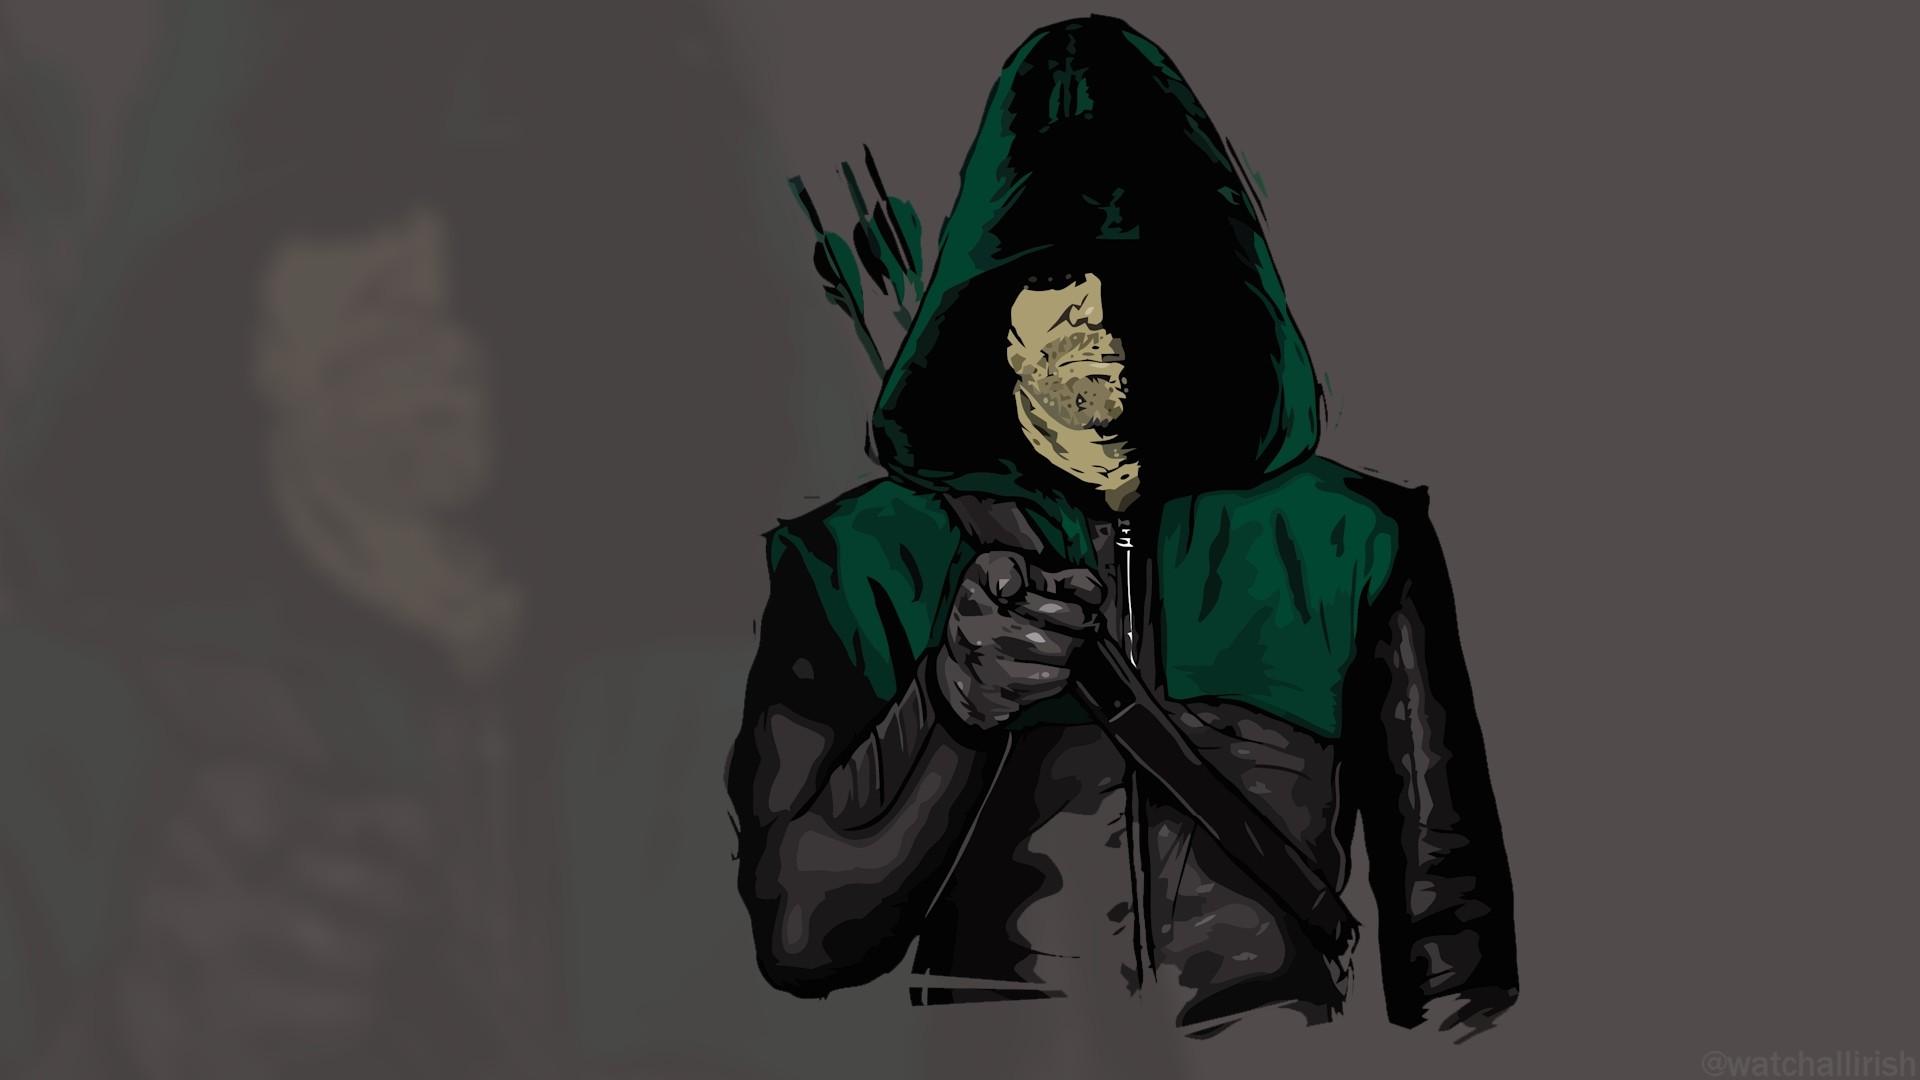 Arrow wallpaper arr